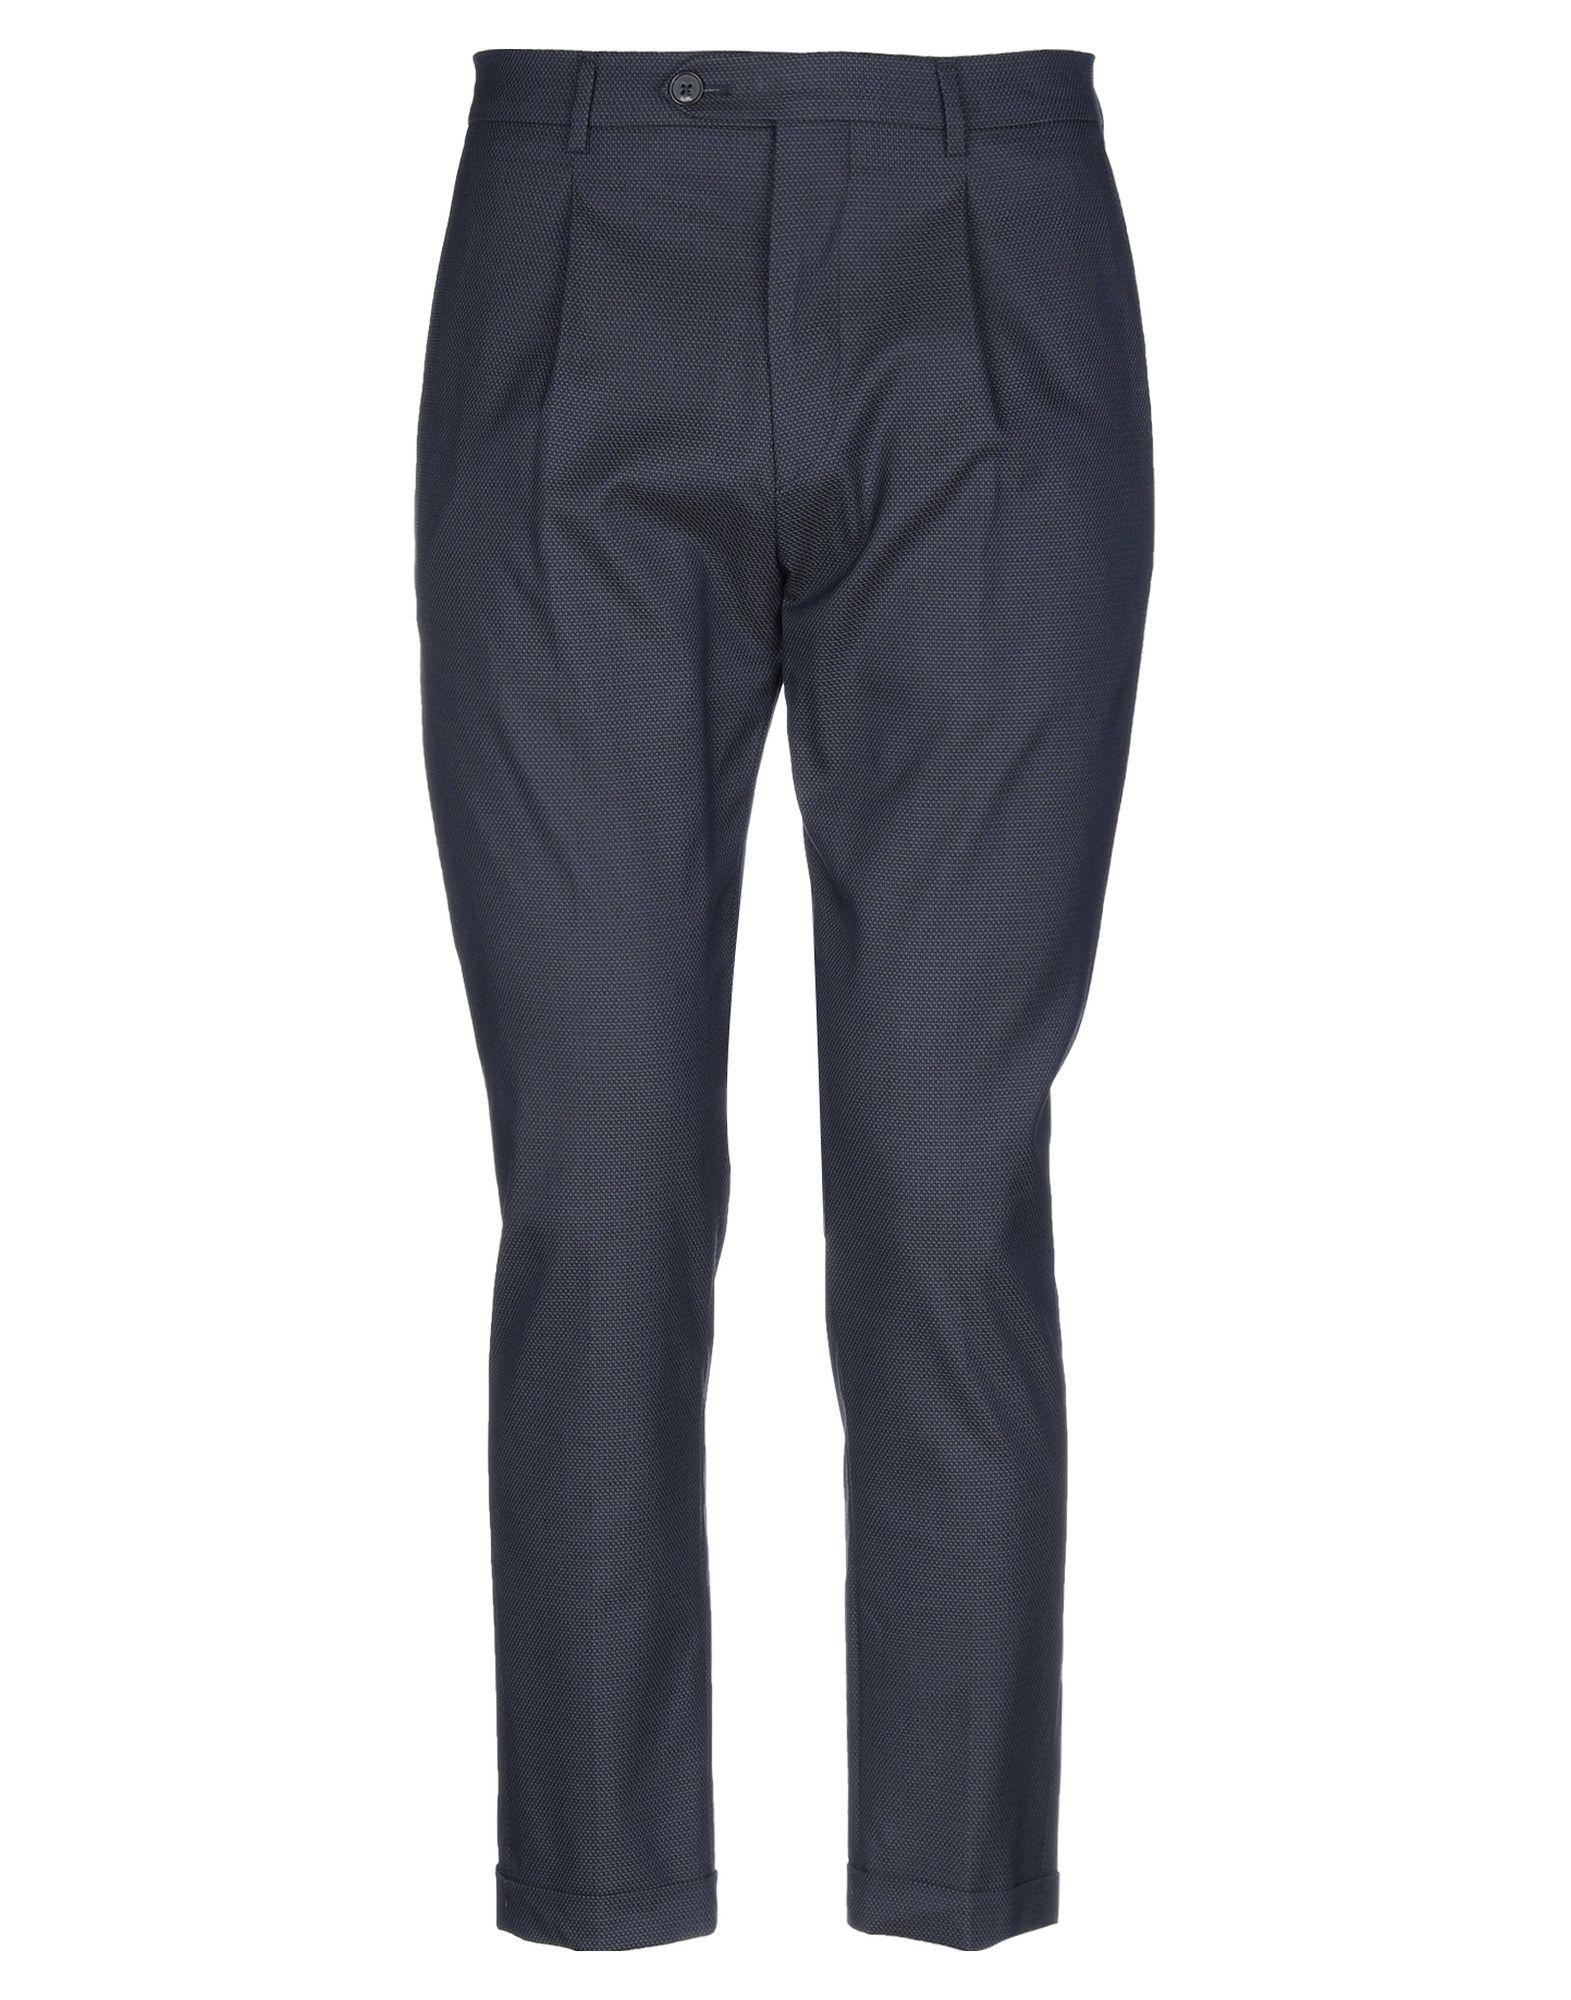 BE ABLE Повседневные брюки монтажно тяговый механизм able wrp 32 20